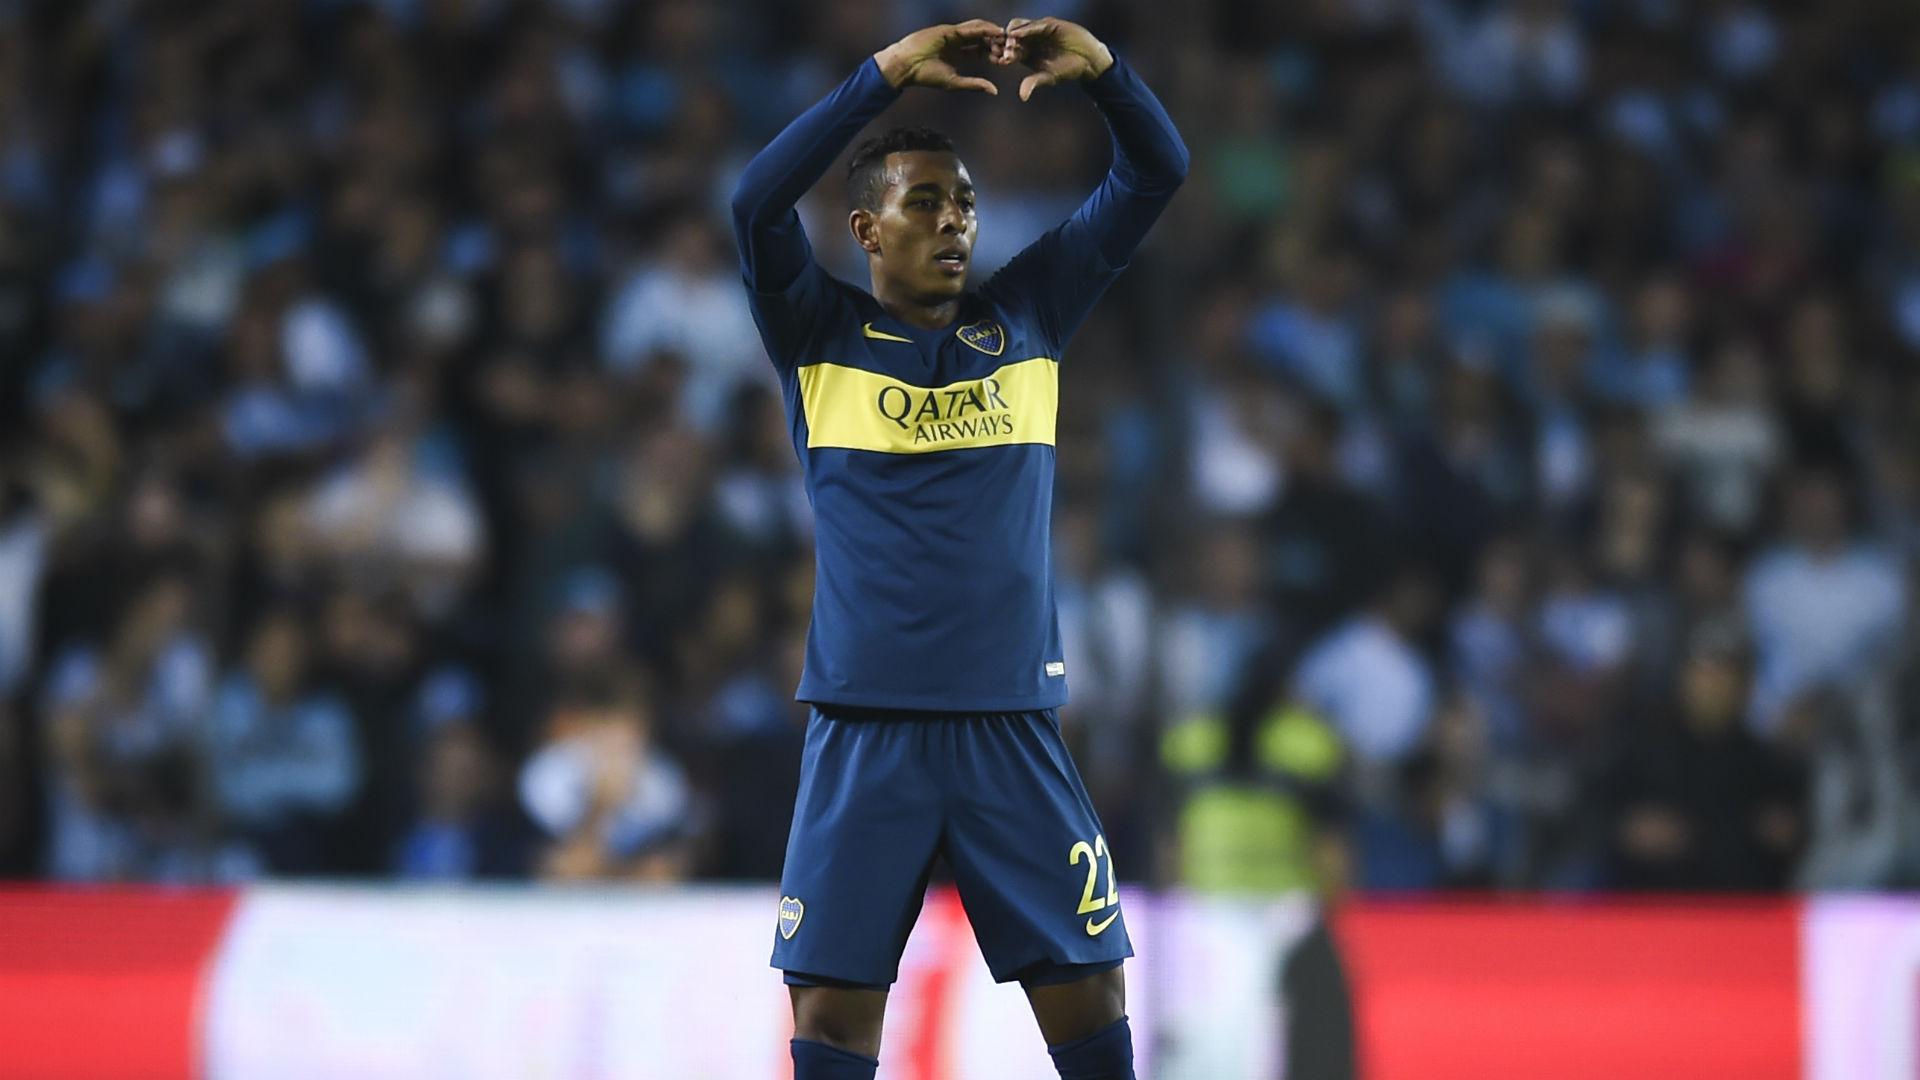 Boca Juniors issue response to Sebastian Villa domestic abuse claims